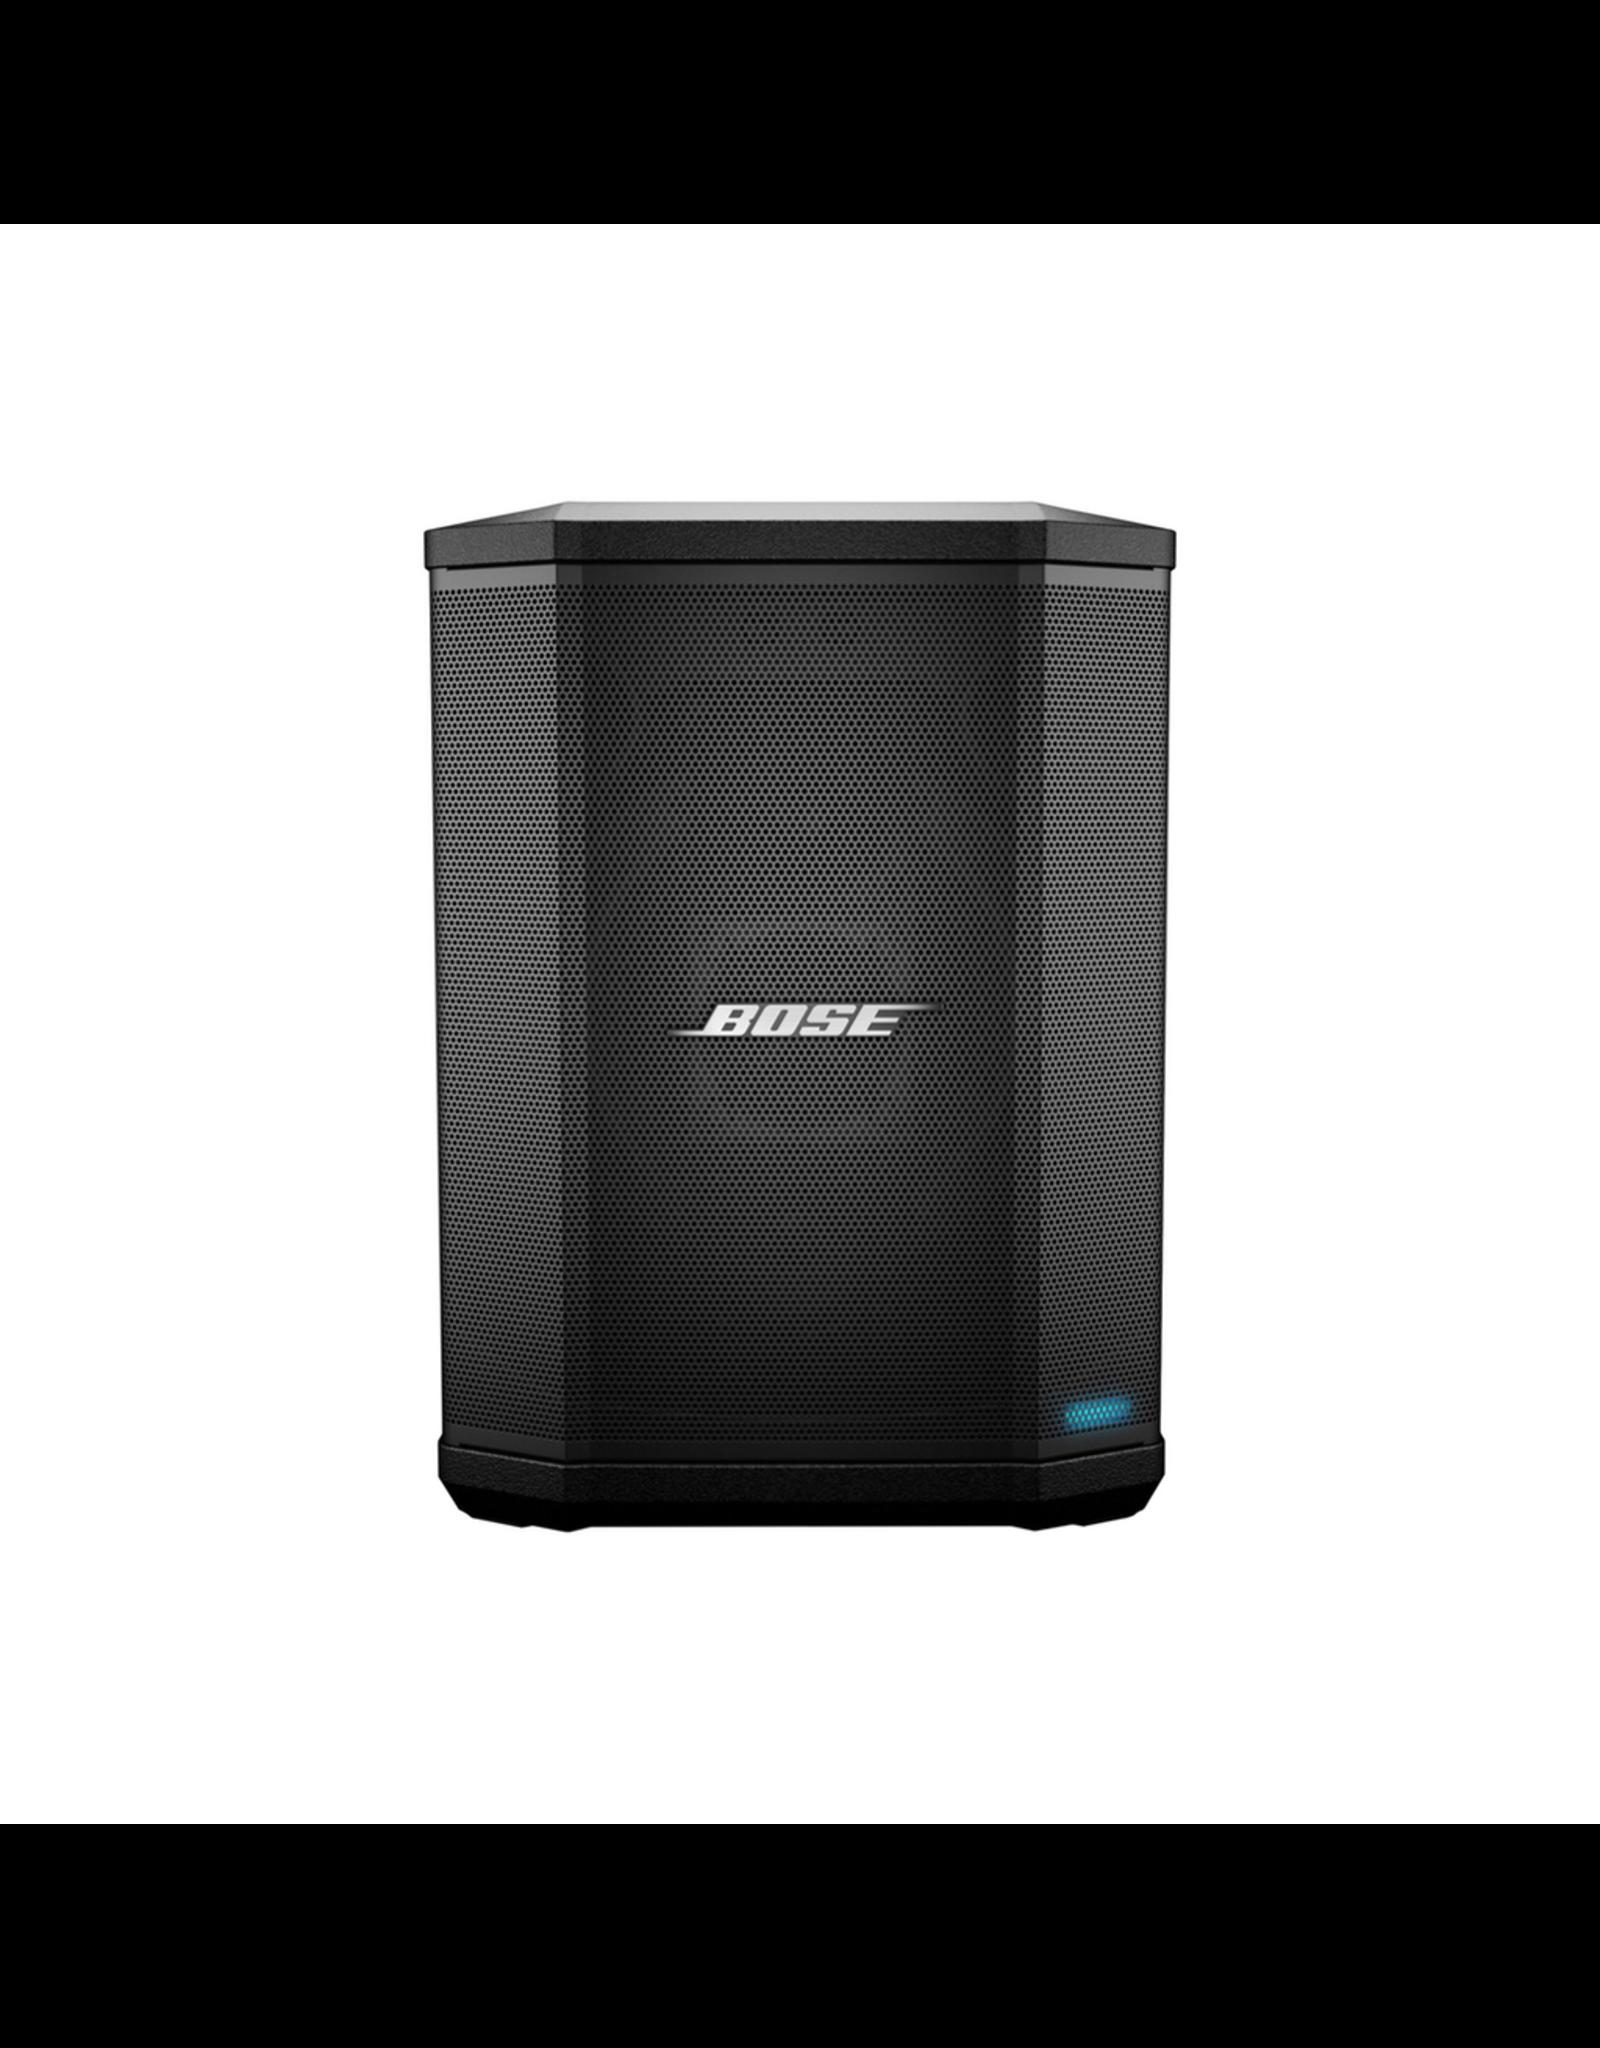 BOSE PRO BOSE S1 PRO Multi Position Bluetooth PA System w/Battery